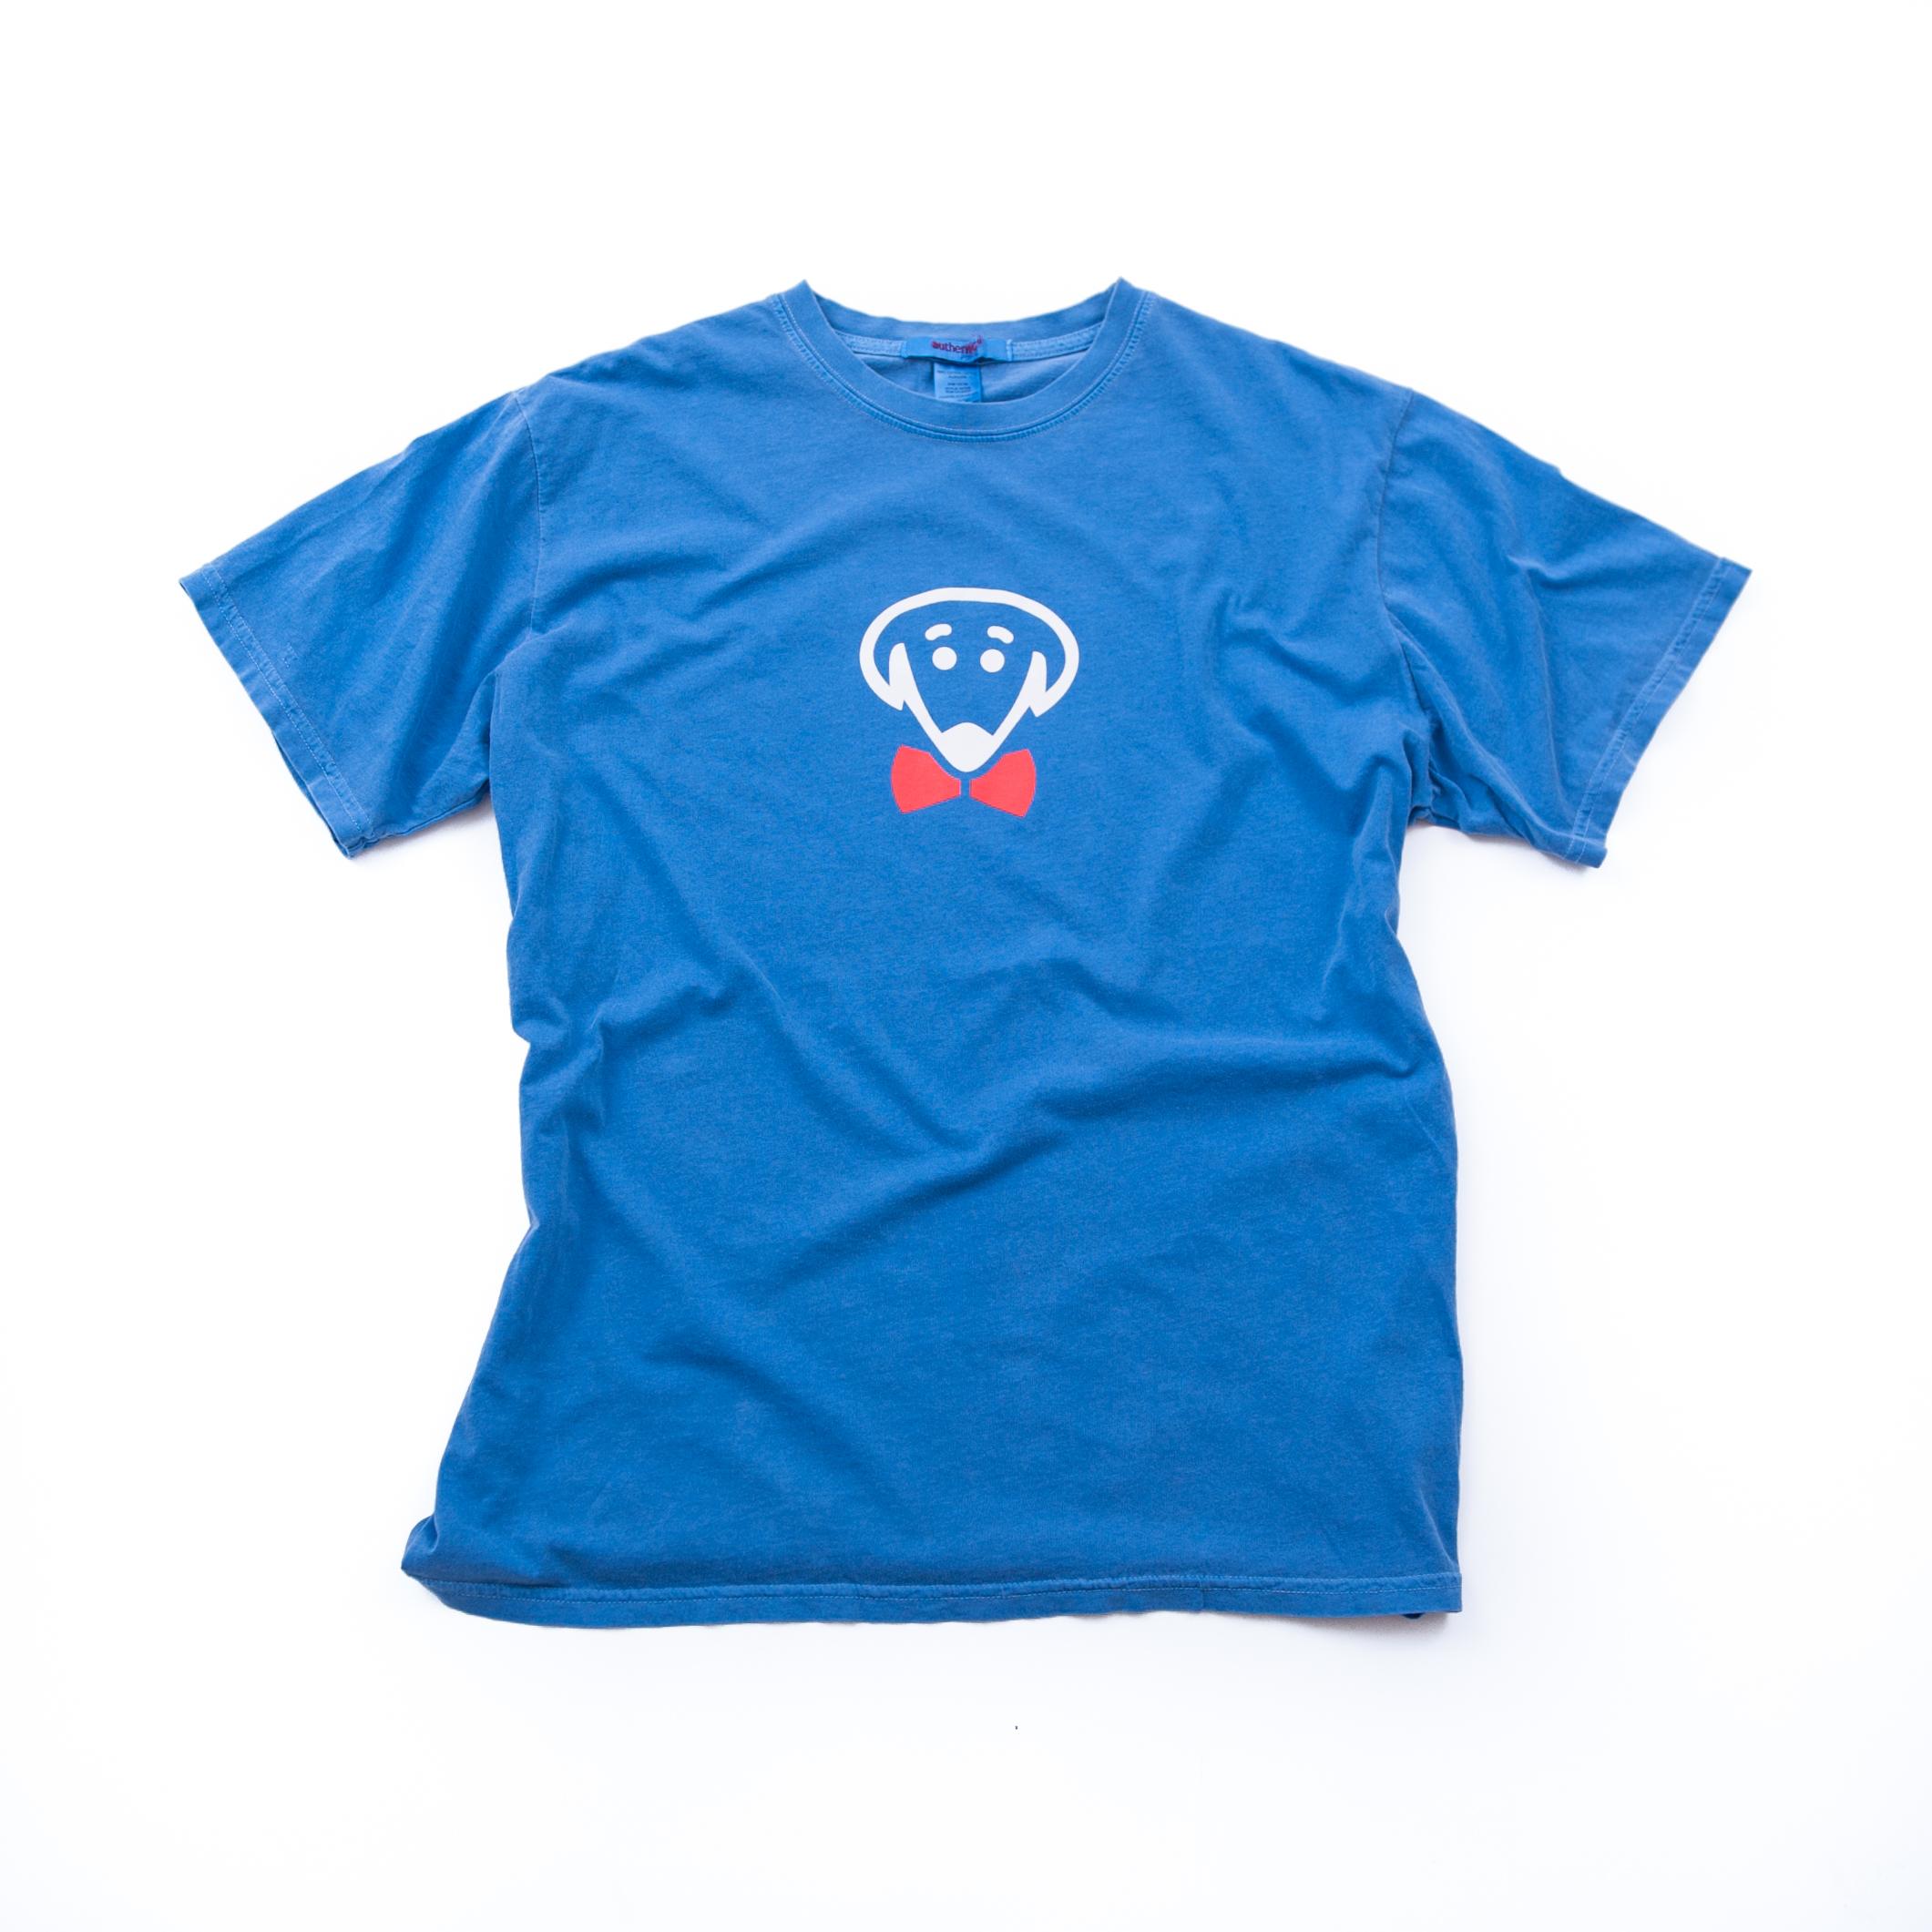 Bow Ties western sky t-shirt